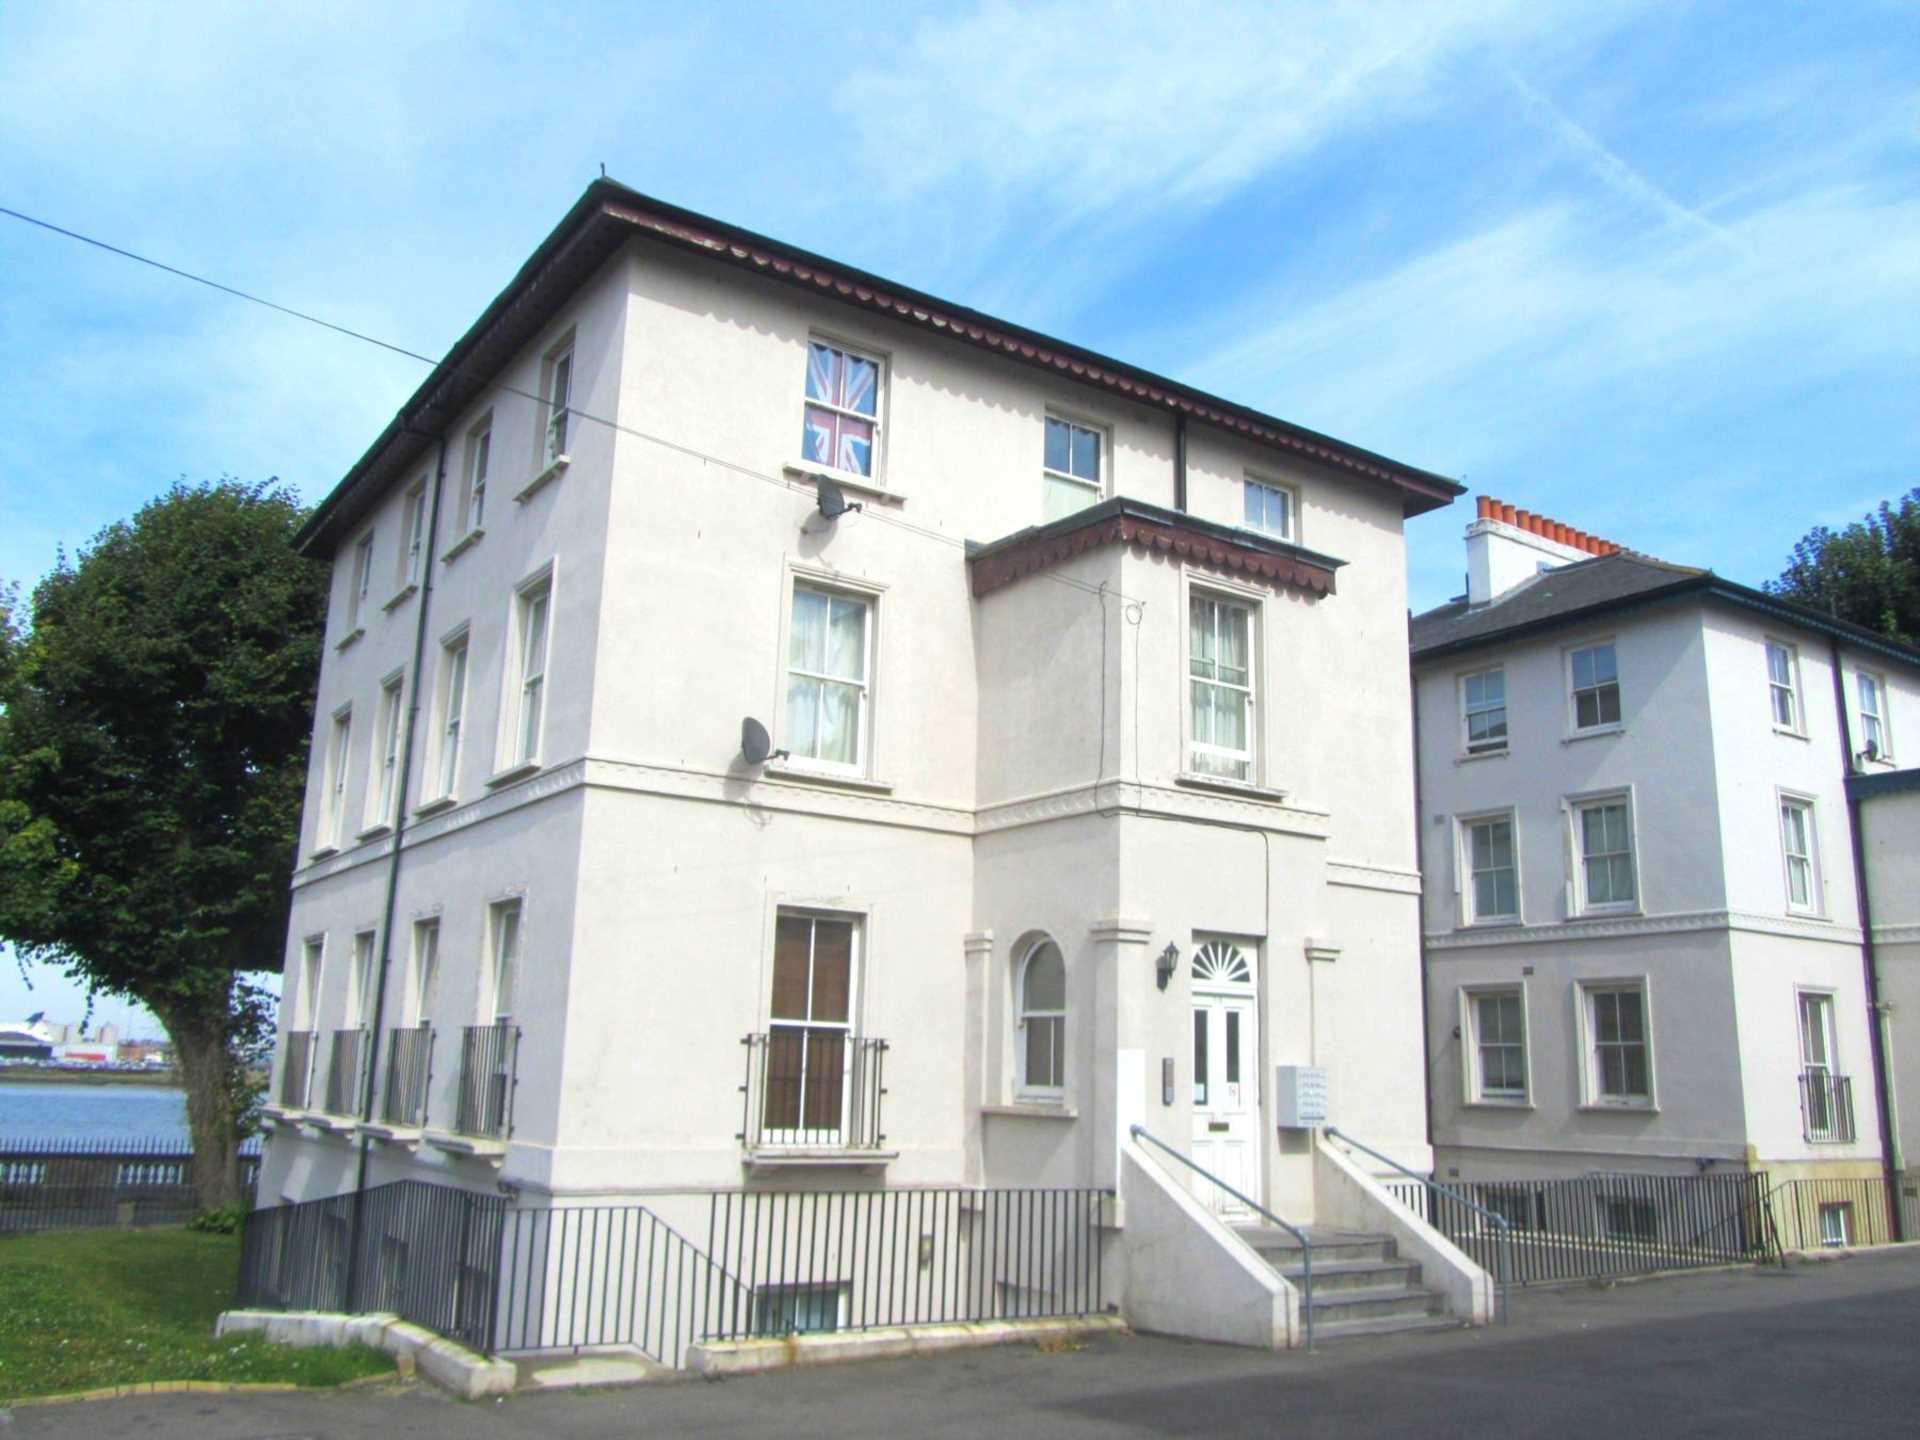 1 Bedroom Apartment For Sale Lansdowne Square Gravesend Da11 9lx